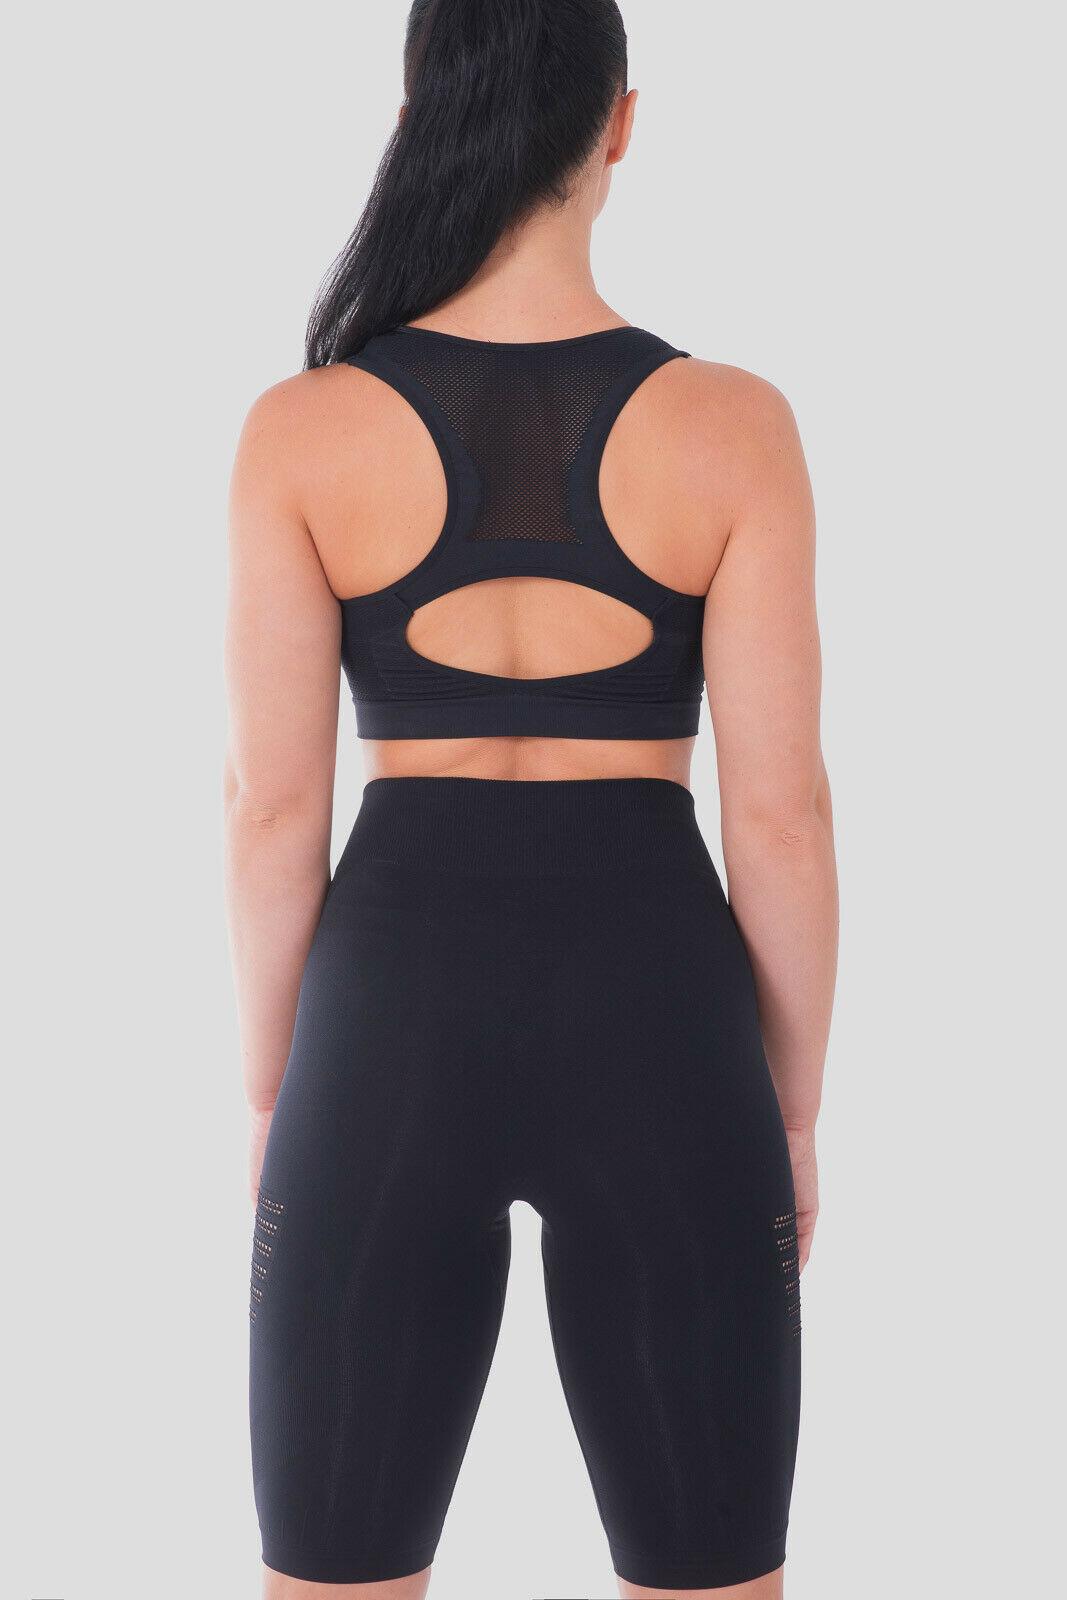 Bellissima-Women-039-s-Sport-Bra-Running-Yoga-Workout-Fitness-Racerback-Seamless thumbnail 21